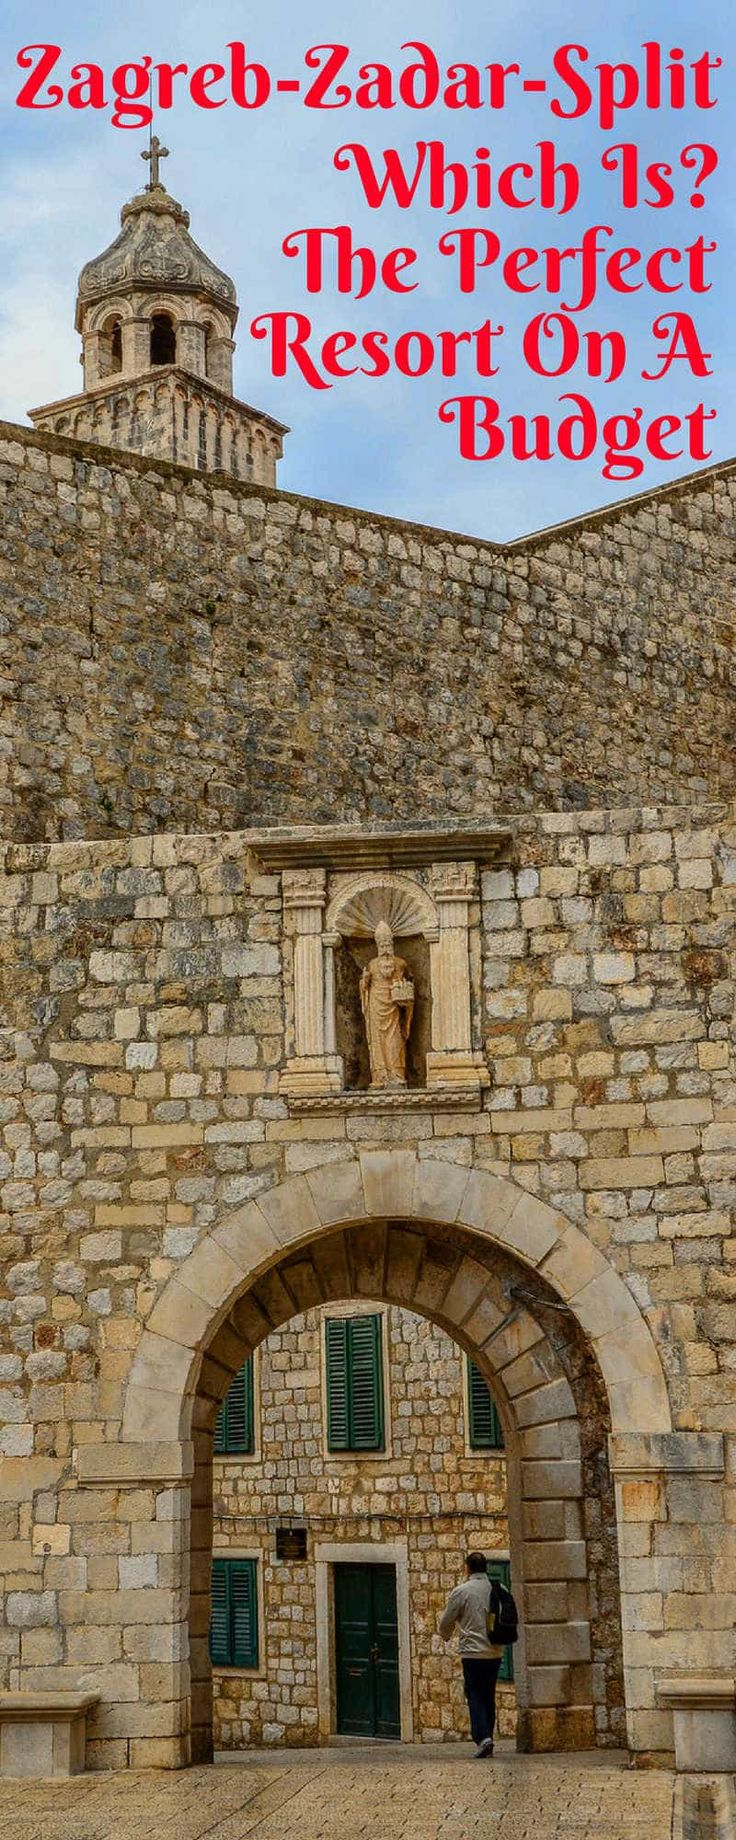 Zagreb-Zadar-Split - Croatia Resorts Which Should I Choose on a Budget